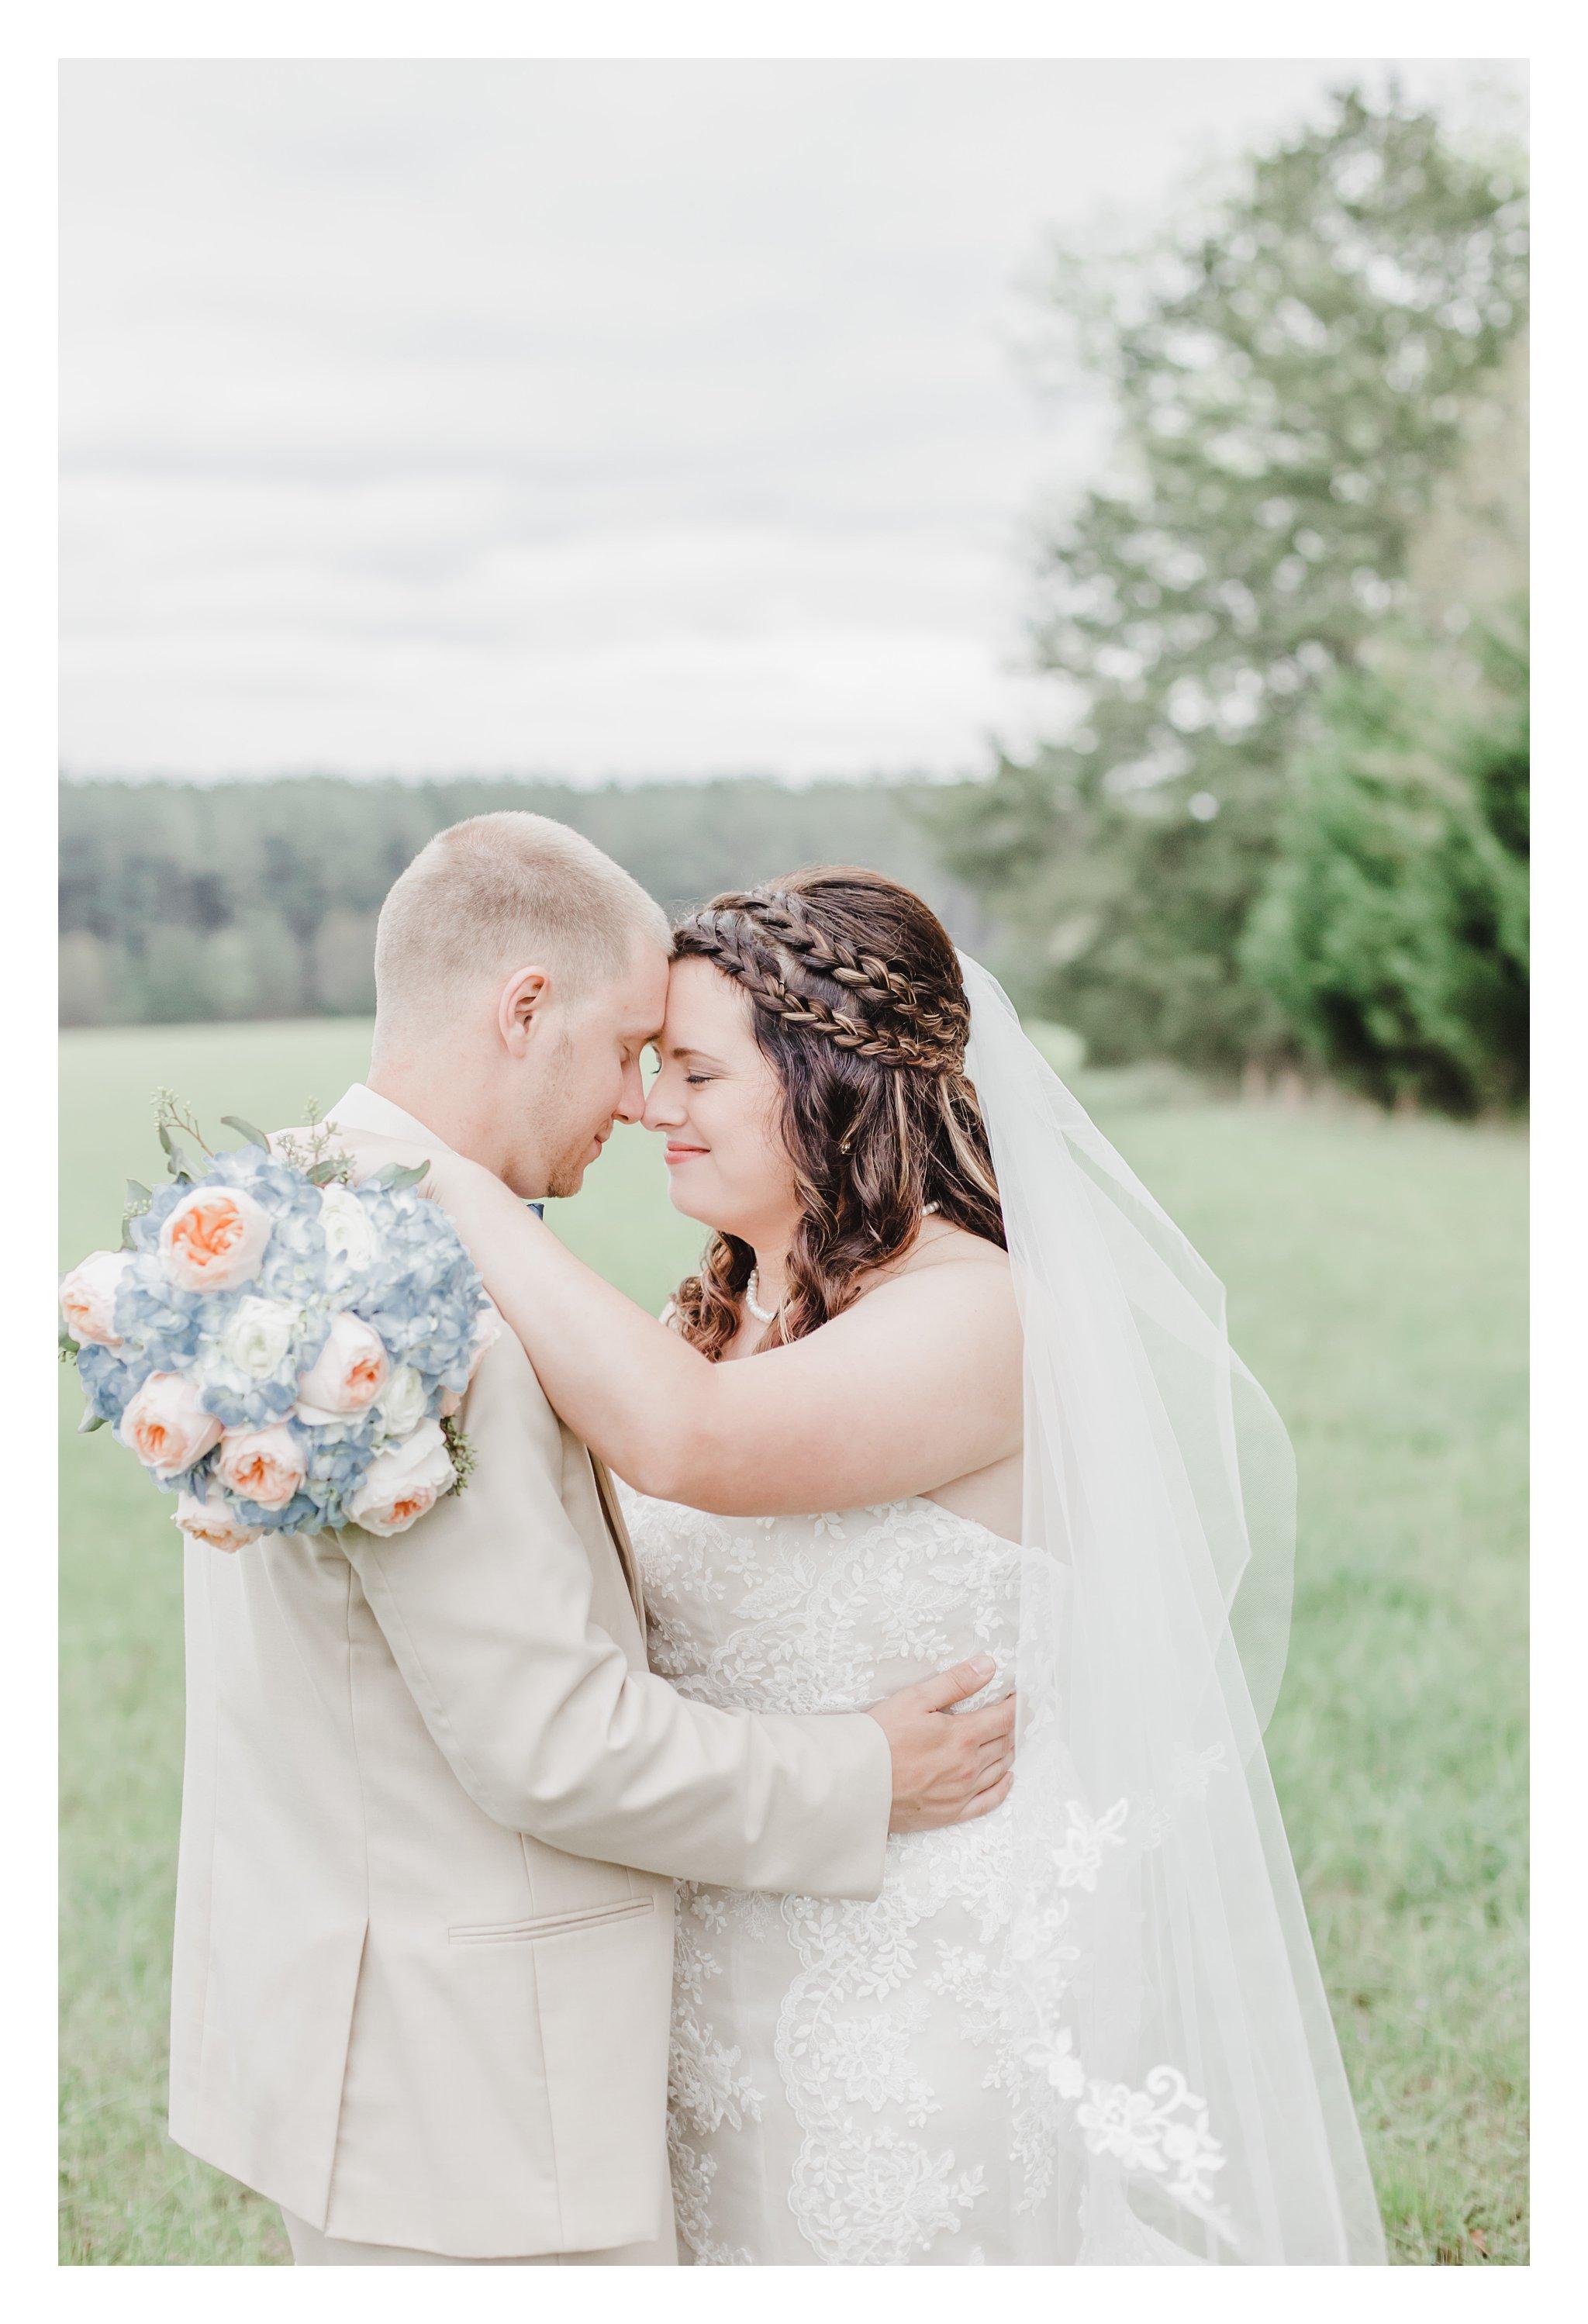 steel-blue-blush-spring-lace-gown-newberry-sc-wedding-photos-_0050.jpg